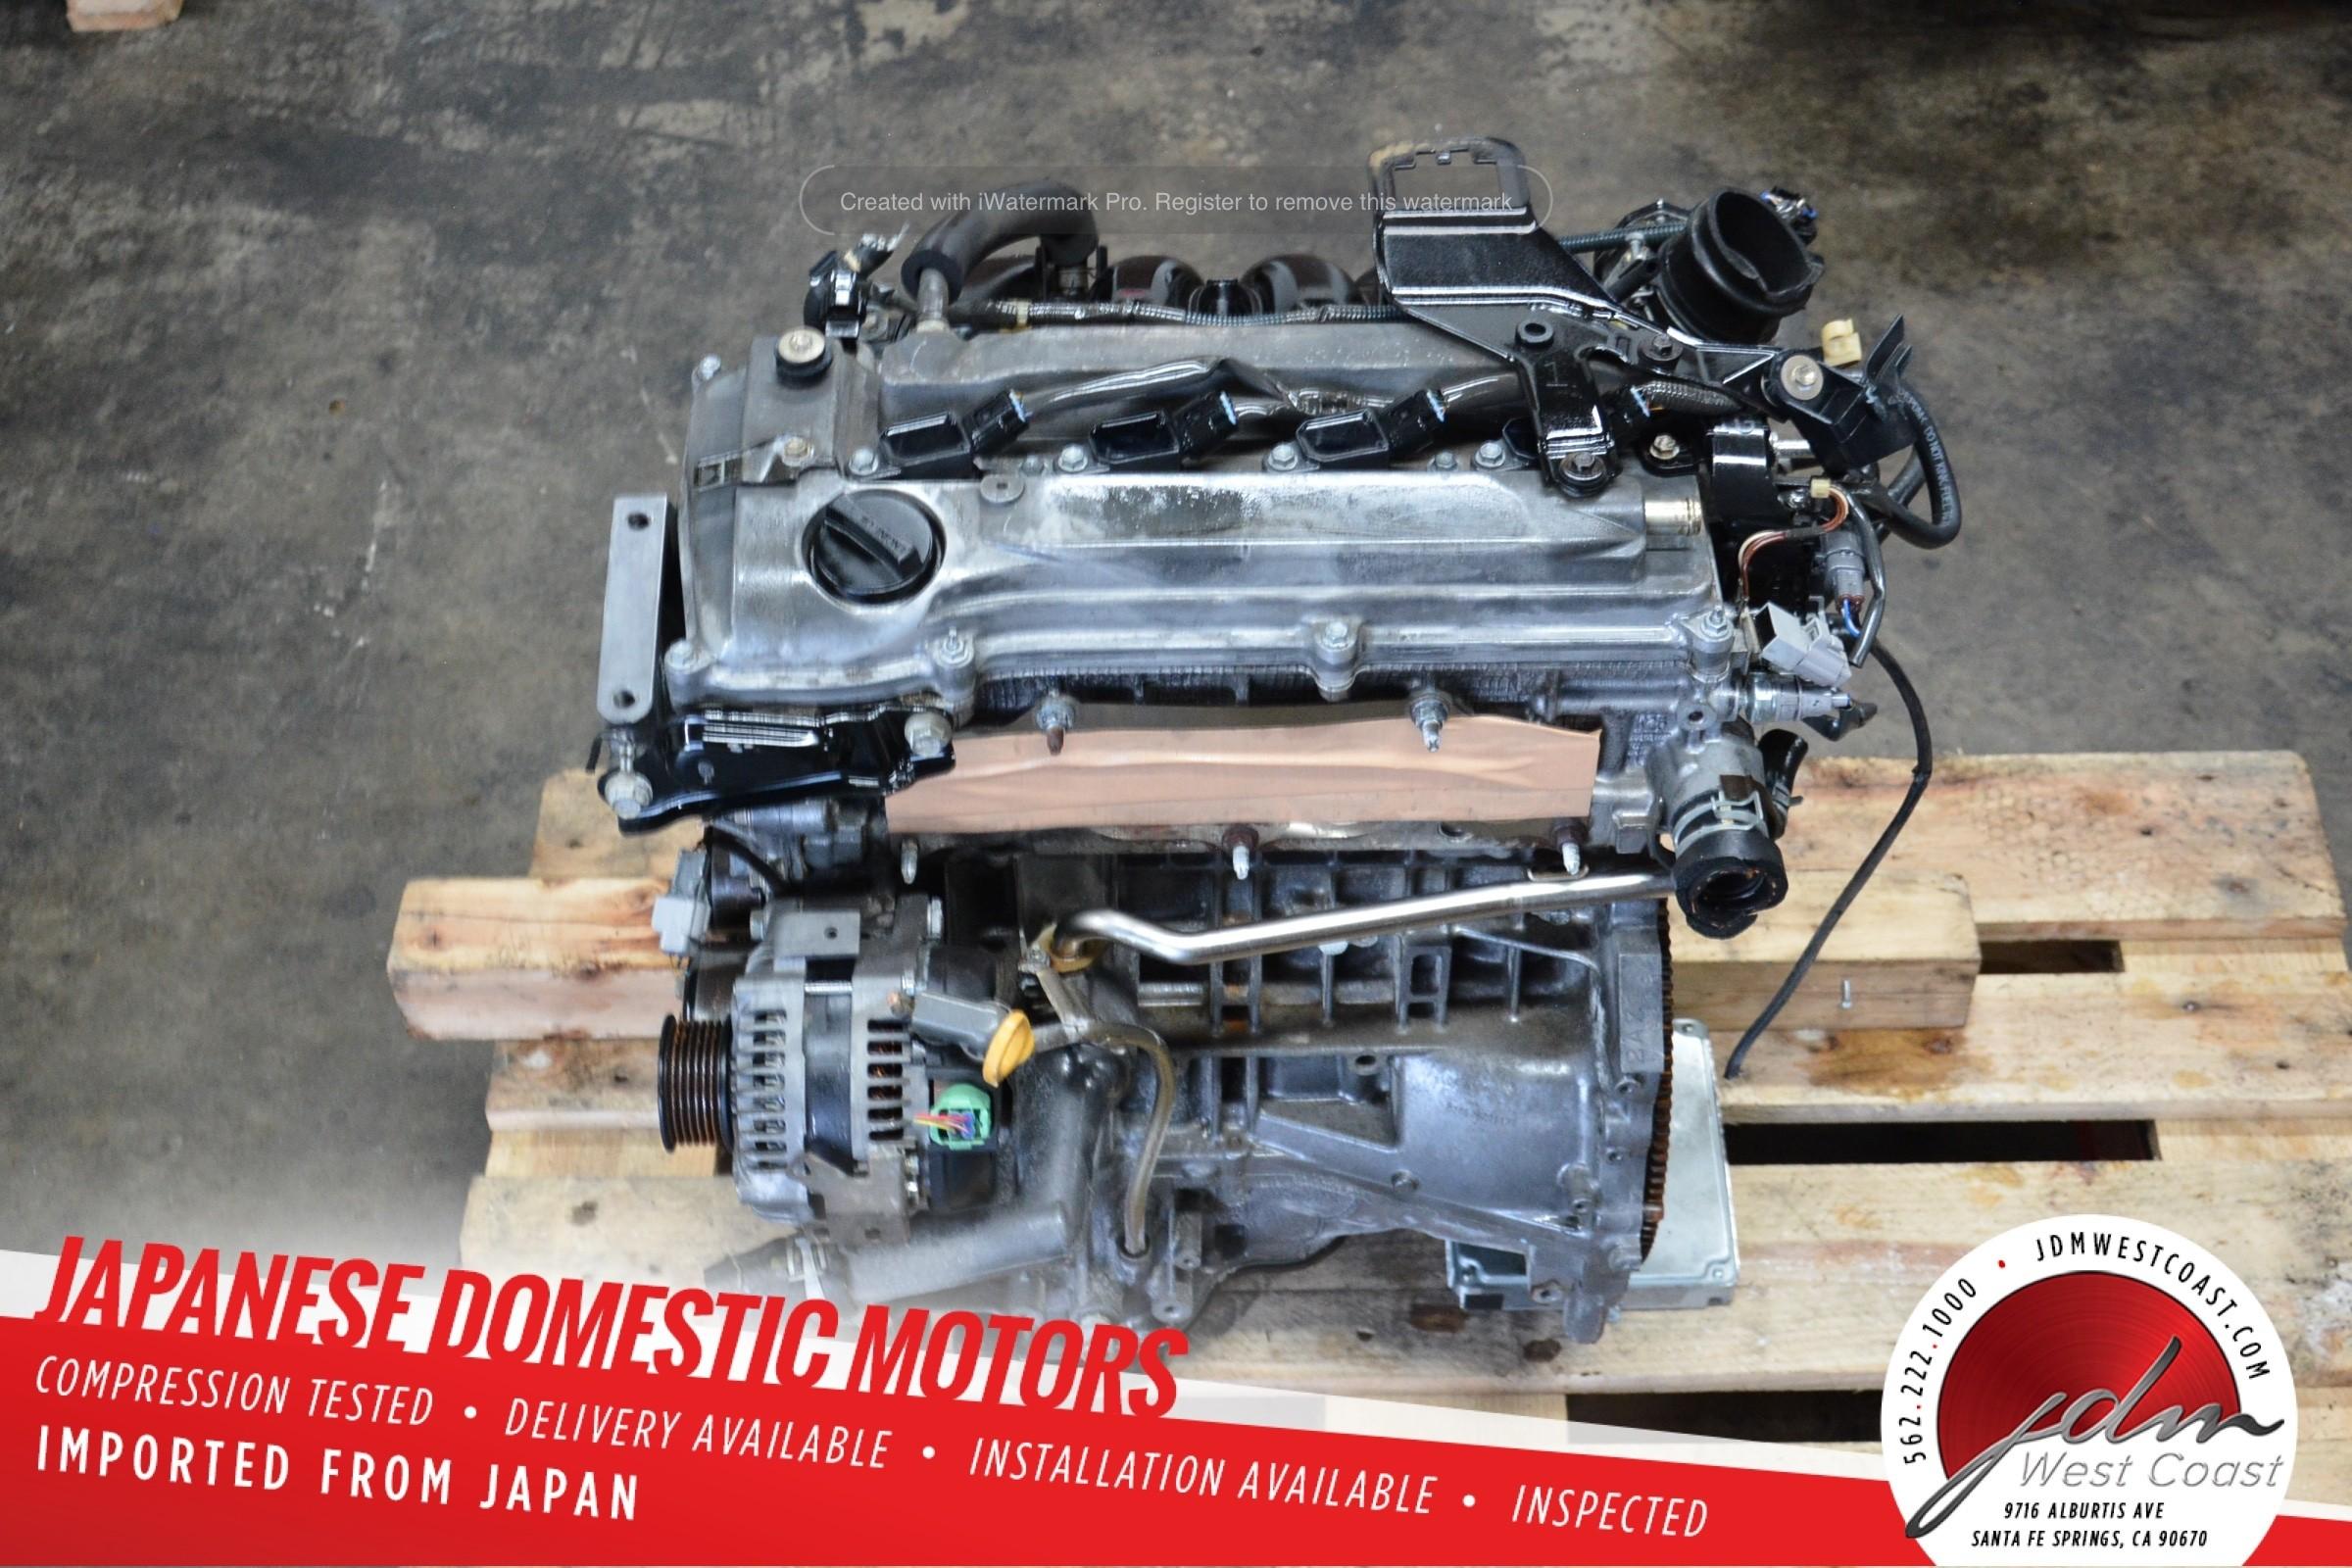 JDM 2AZ Toyota Camry, Scion tC, Toyota RAV4, Highlander 2.4L 4 cylinder engine